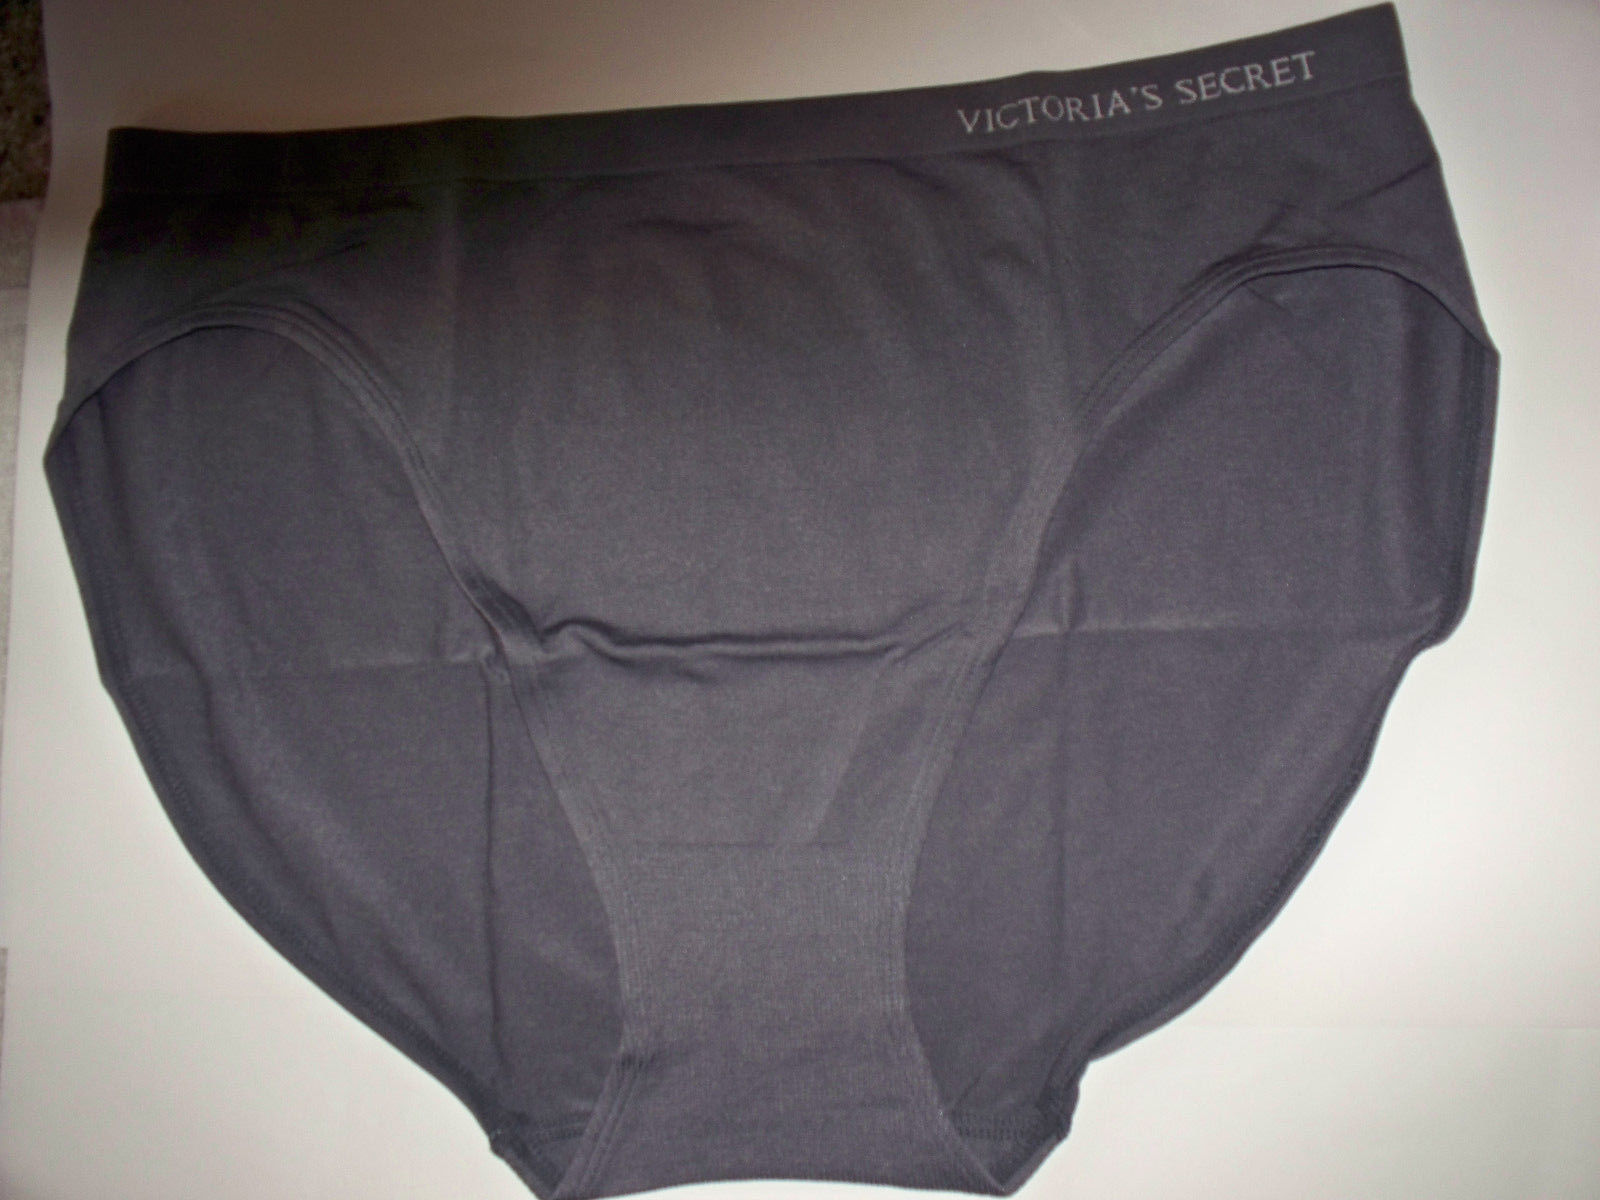 VICTORIA/'S SECRET High Waist Brief Black Panty M L No Show Seamless Silver Heart